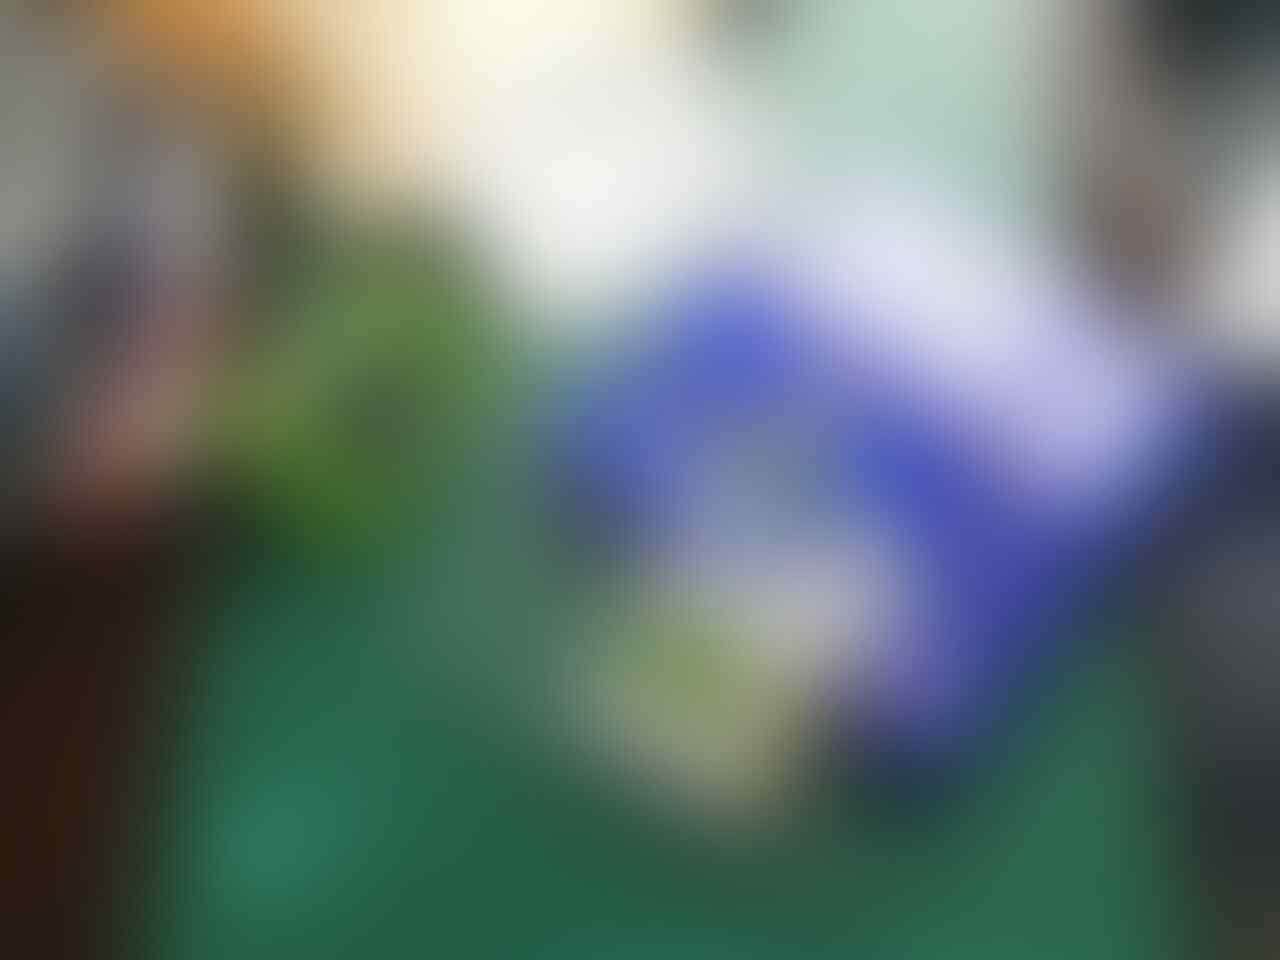 BATRE BATERAI VIZZ HIPPO DOUBLE POWER SAMSUNG GALAXY S2 S3 MINI S4 S5 ACE NOTE 2 3 4